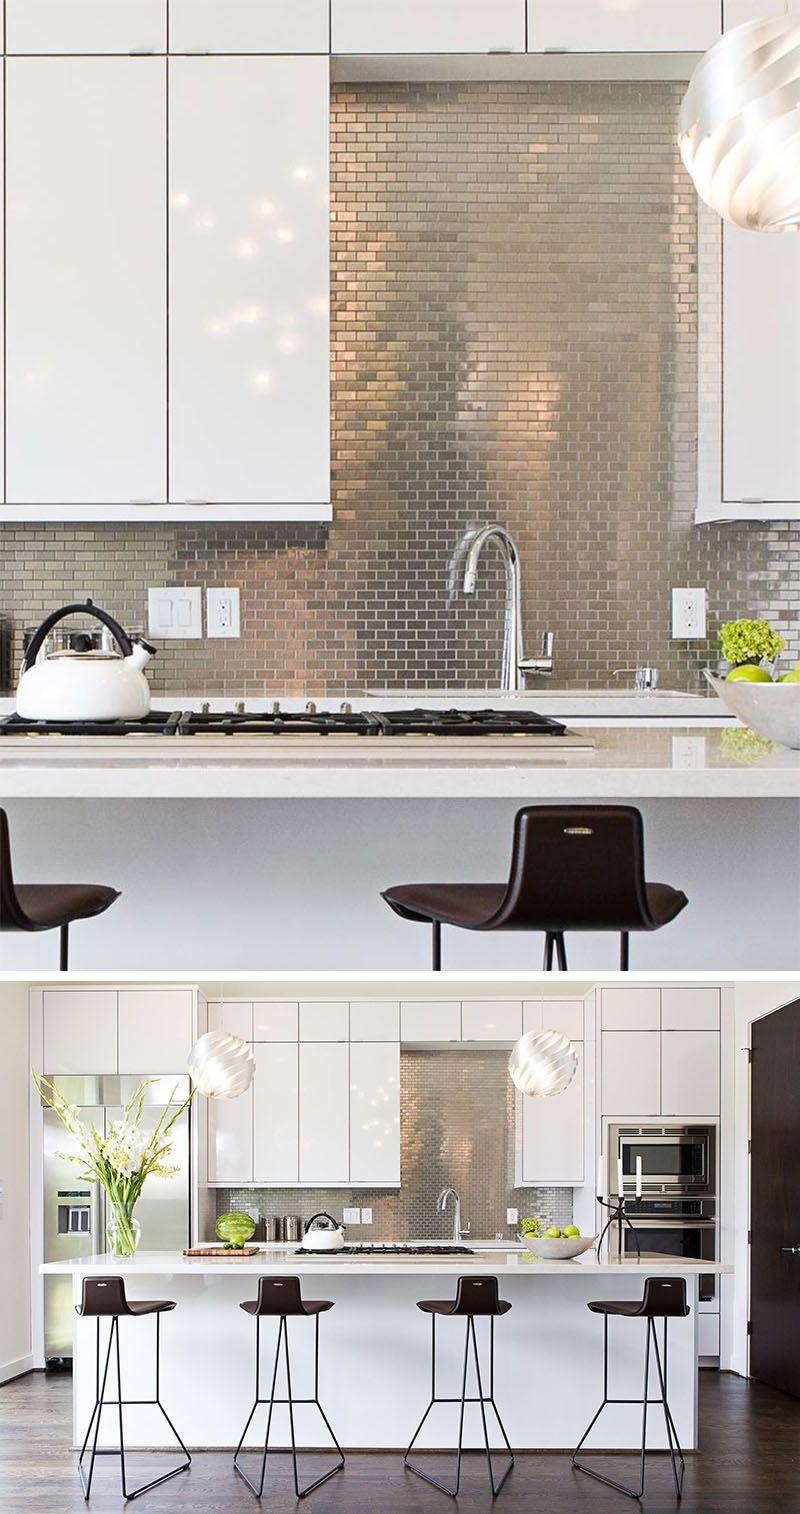 Kitchen Design Idea Install A Stainless Steel Backsplash For A Sleek Look Trendy Kitchen Backsplash Backsplash